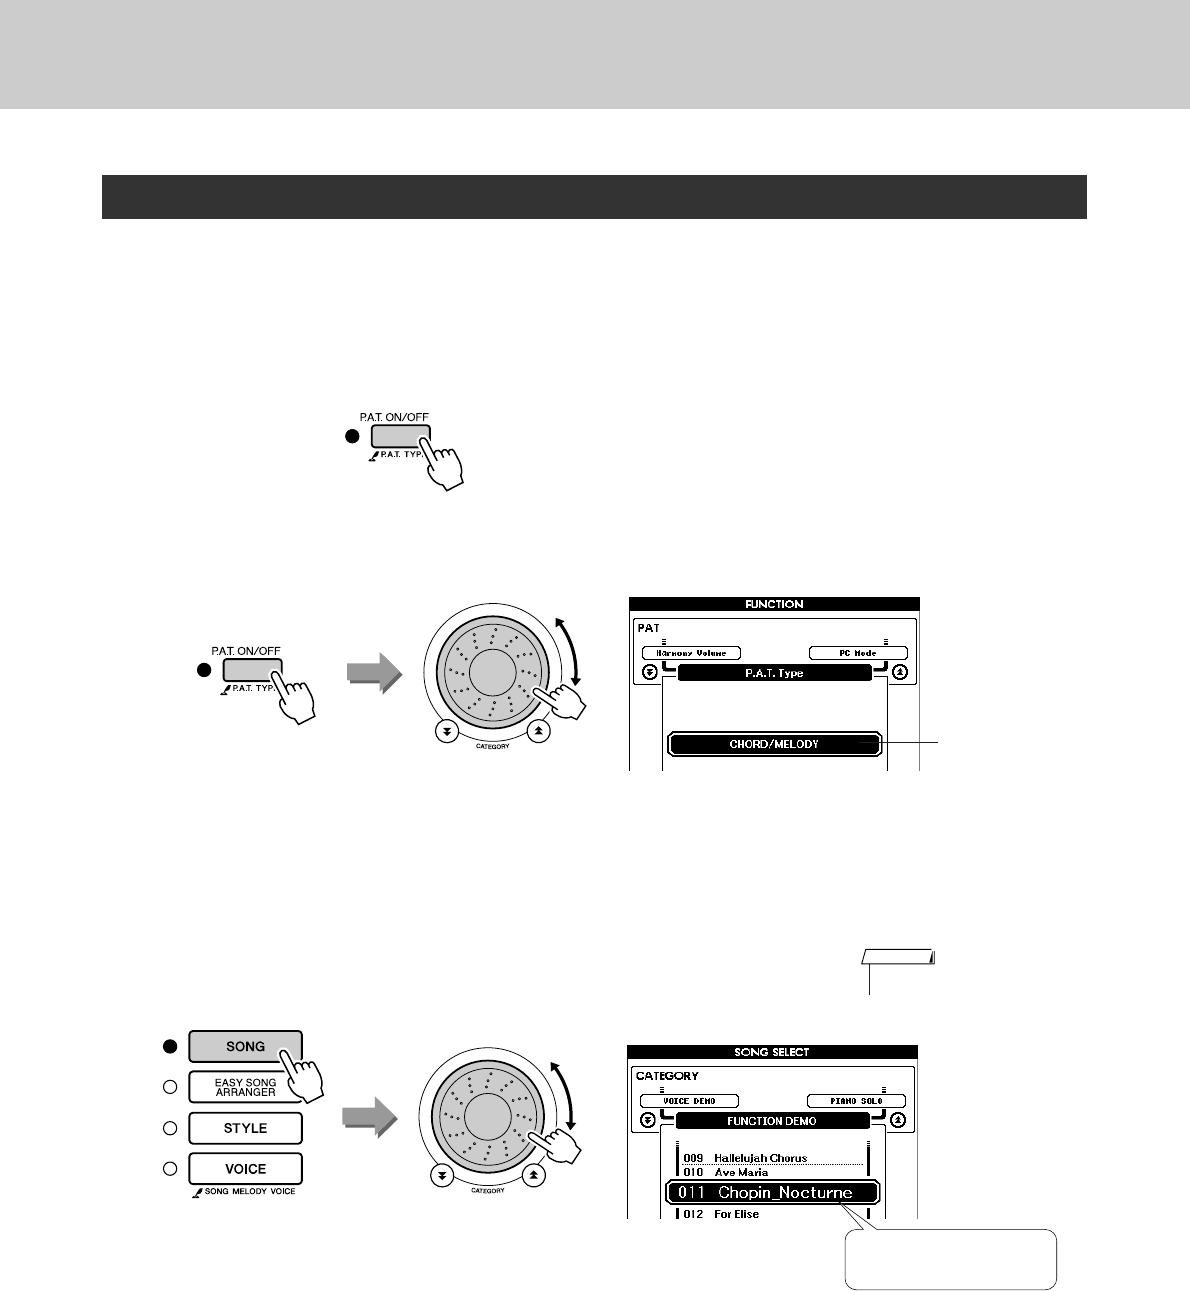 Yamaha Portable Grand Dgx 520 Owners Manual